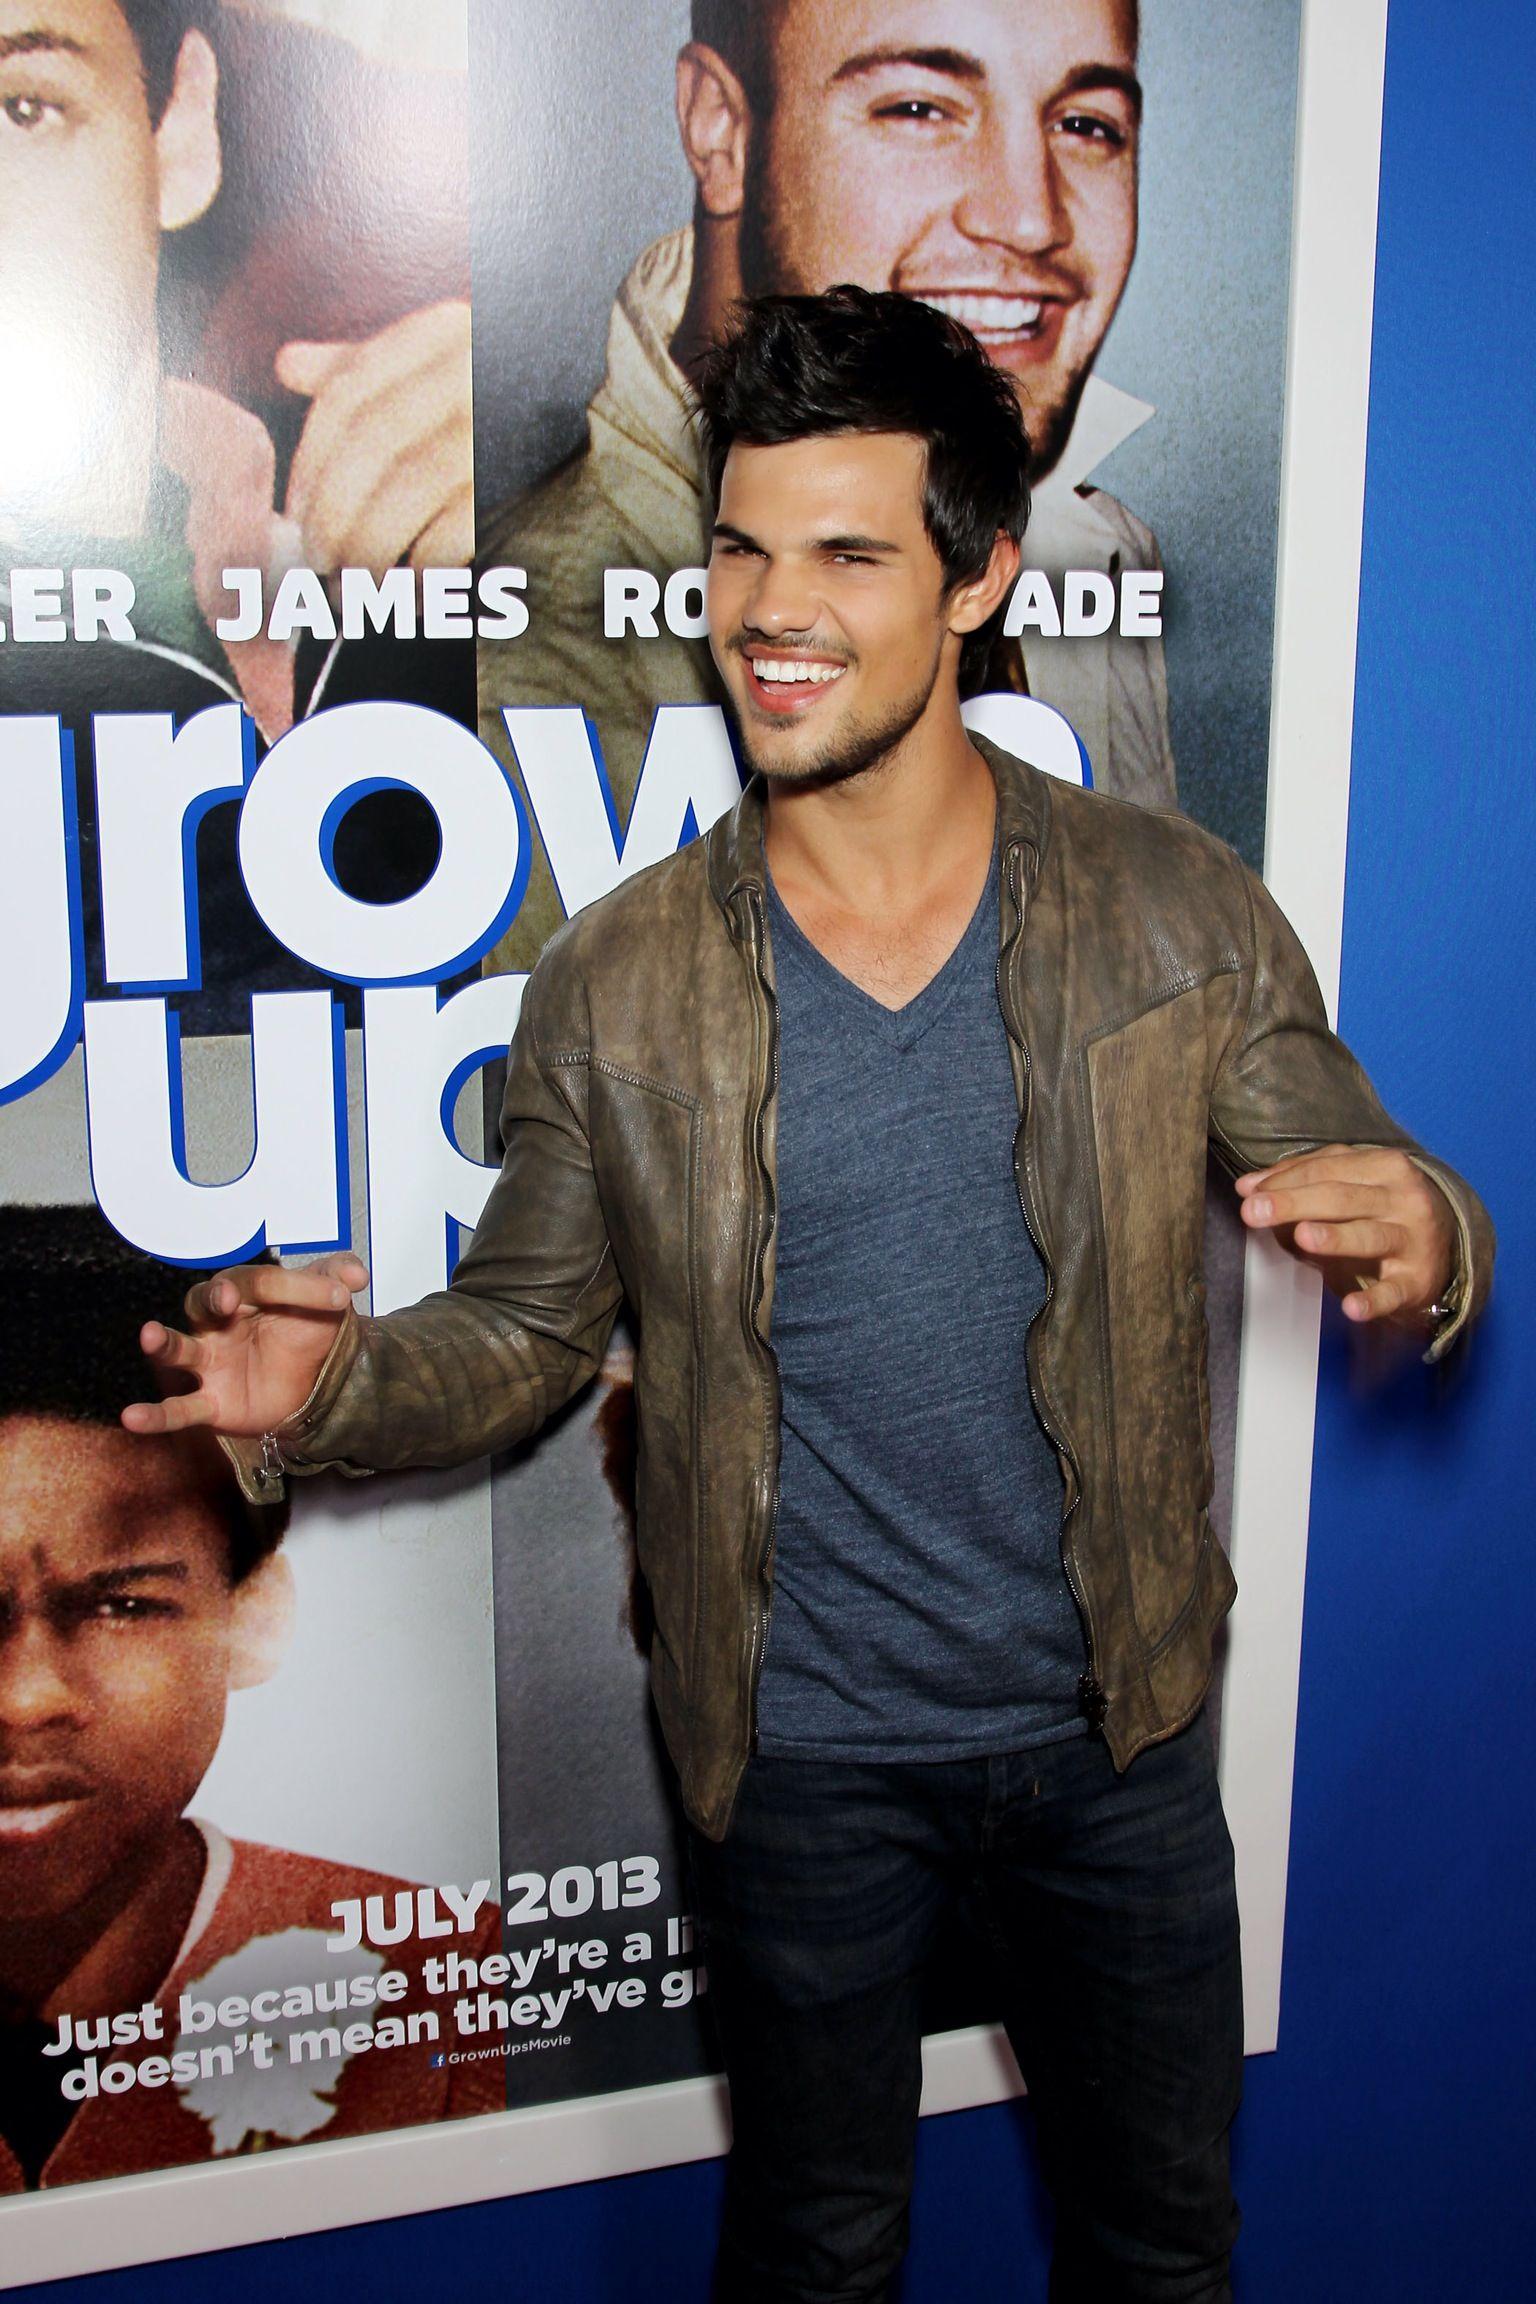 Taylor lautner grown ups 2 premiere